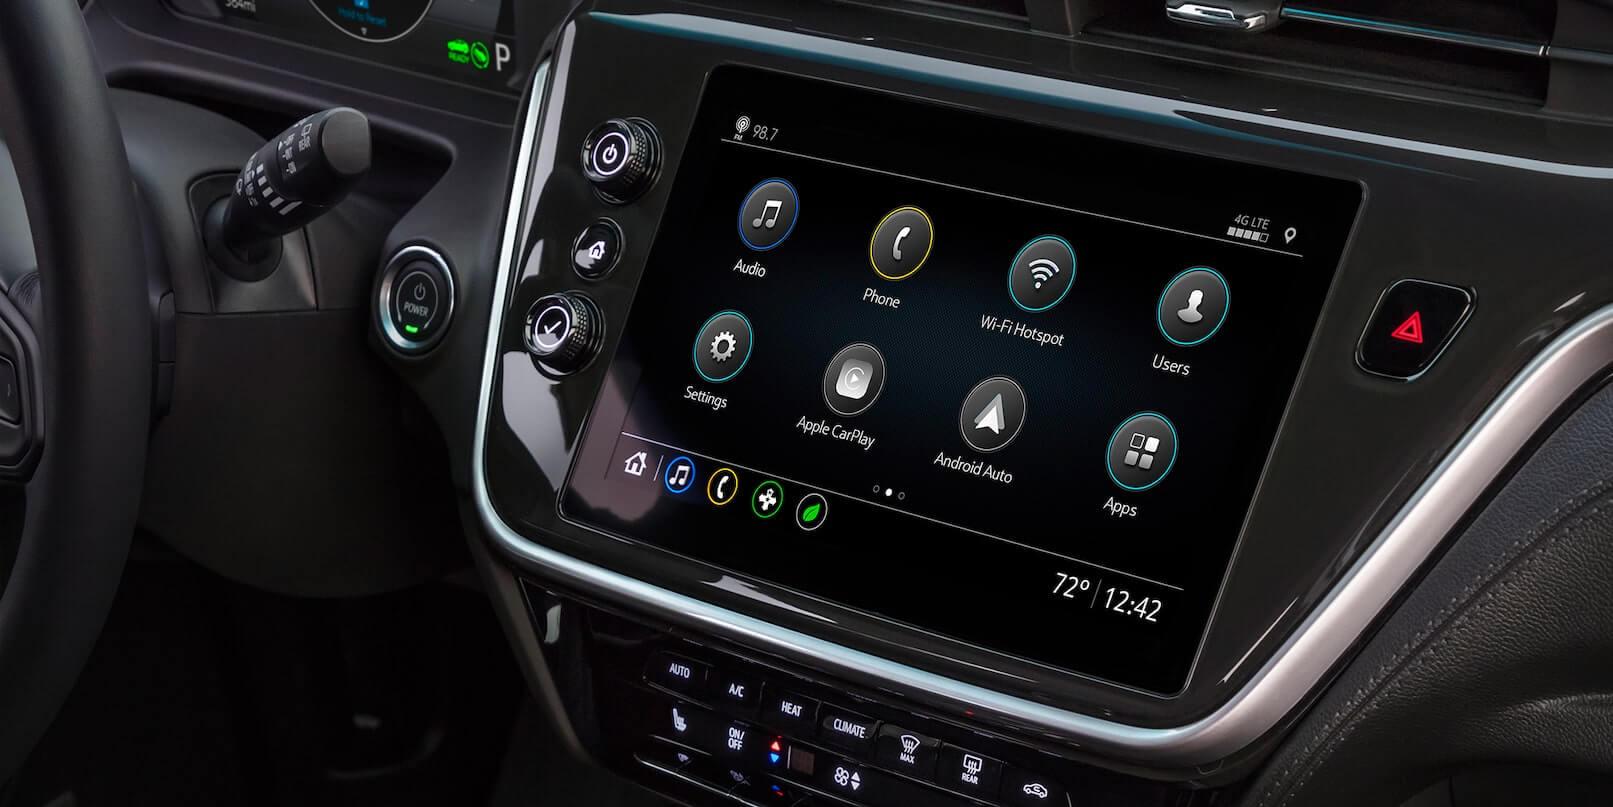 2022 Bolt EV infotainment system.